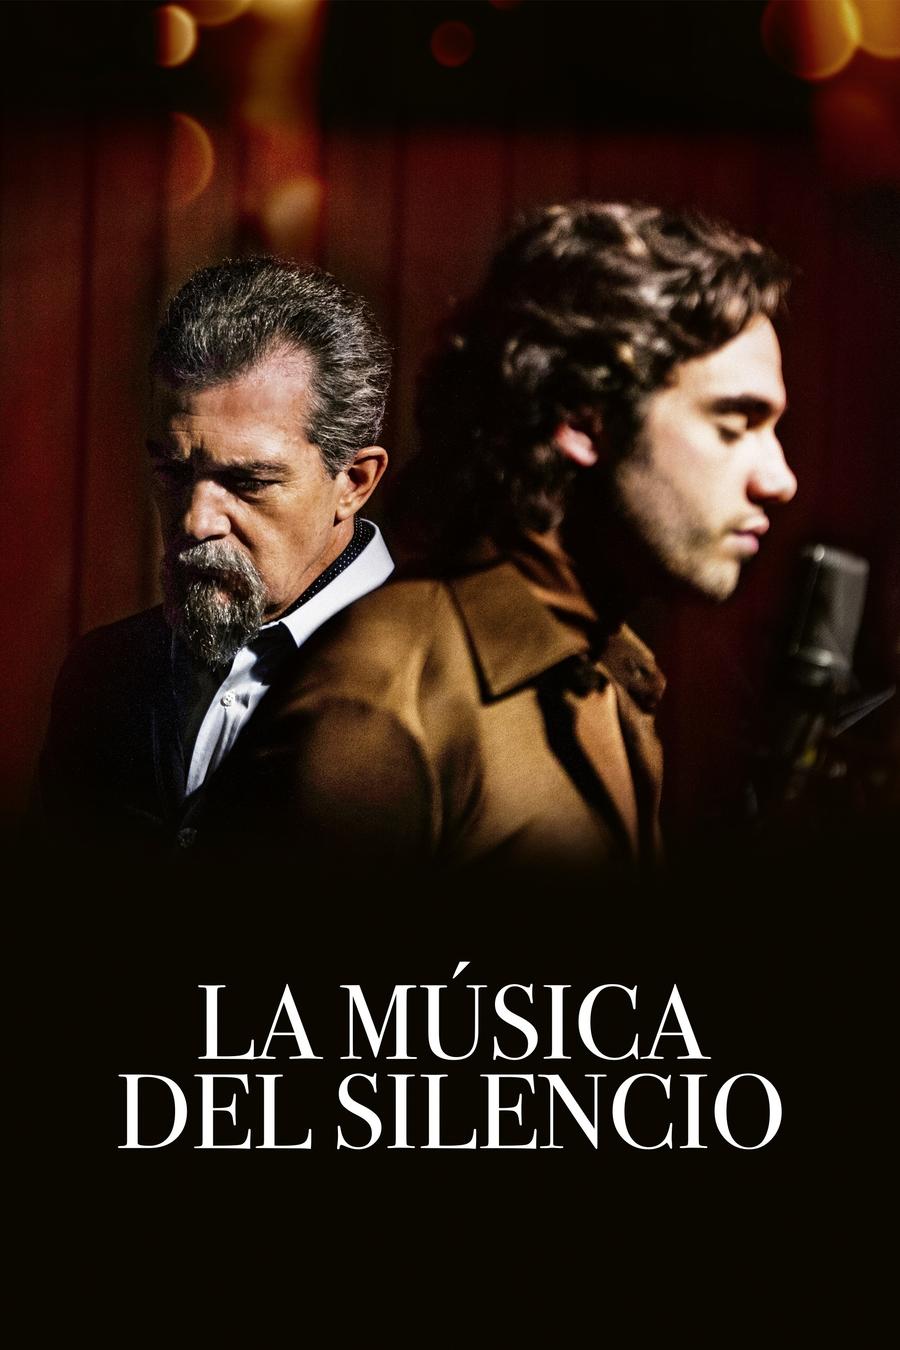 La música del silenci